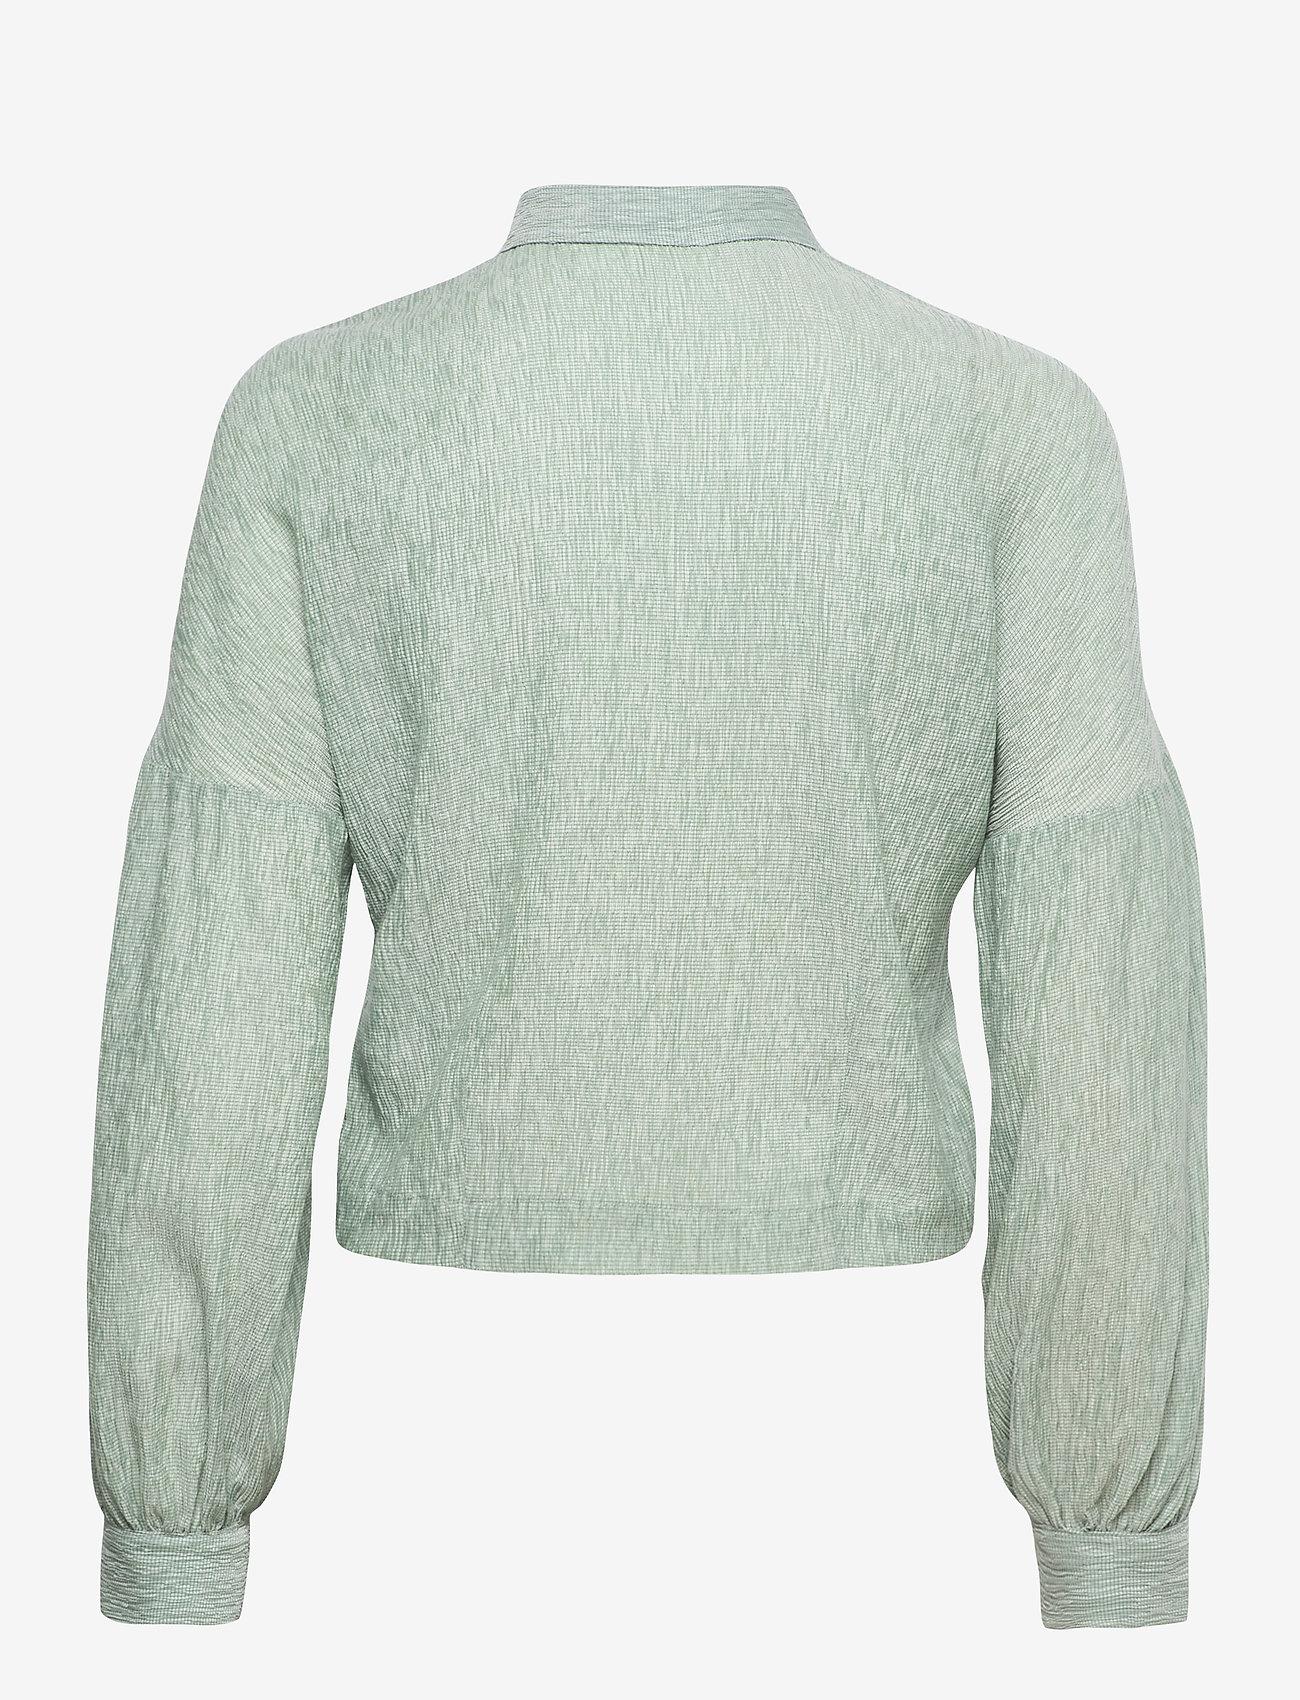 Storm & Marie - Theresa Shirt - long-sleeved shirts - quiet green - 1